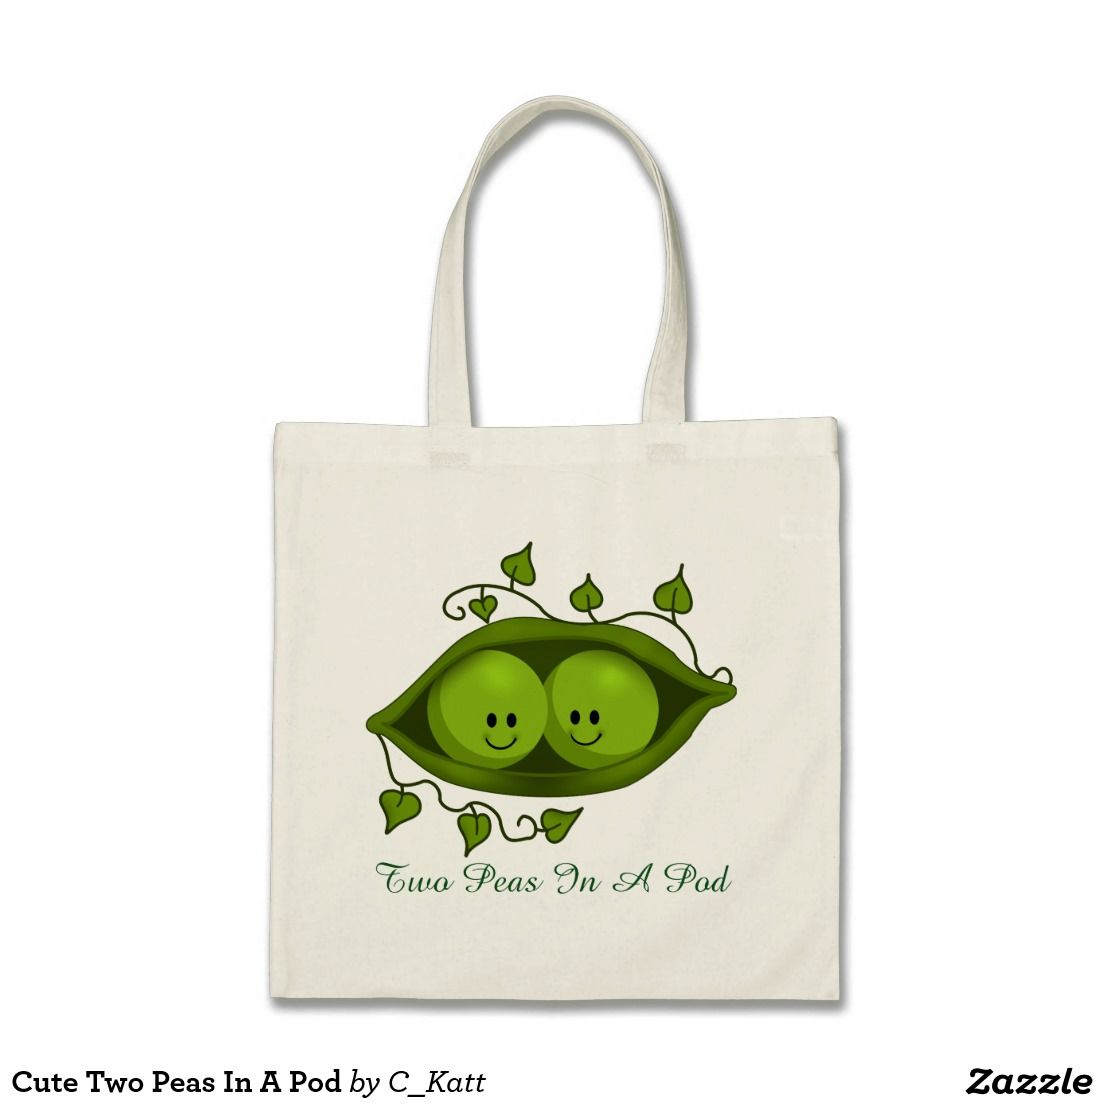 Cute Two Peas In A Pod Tote Bag | Tote bag